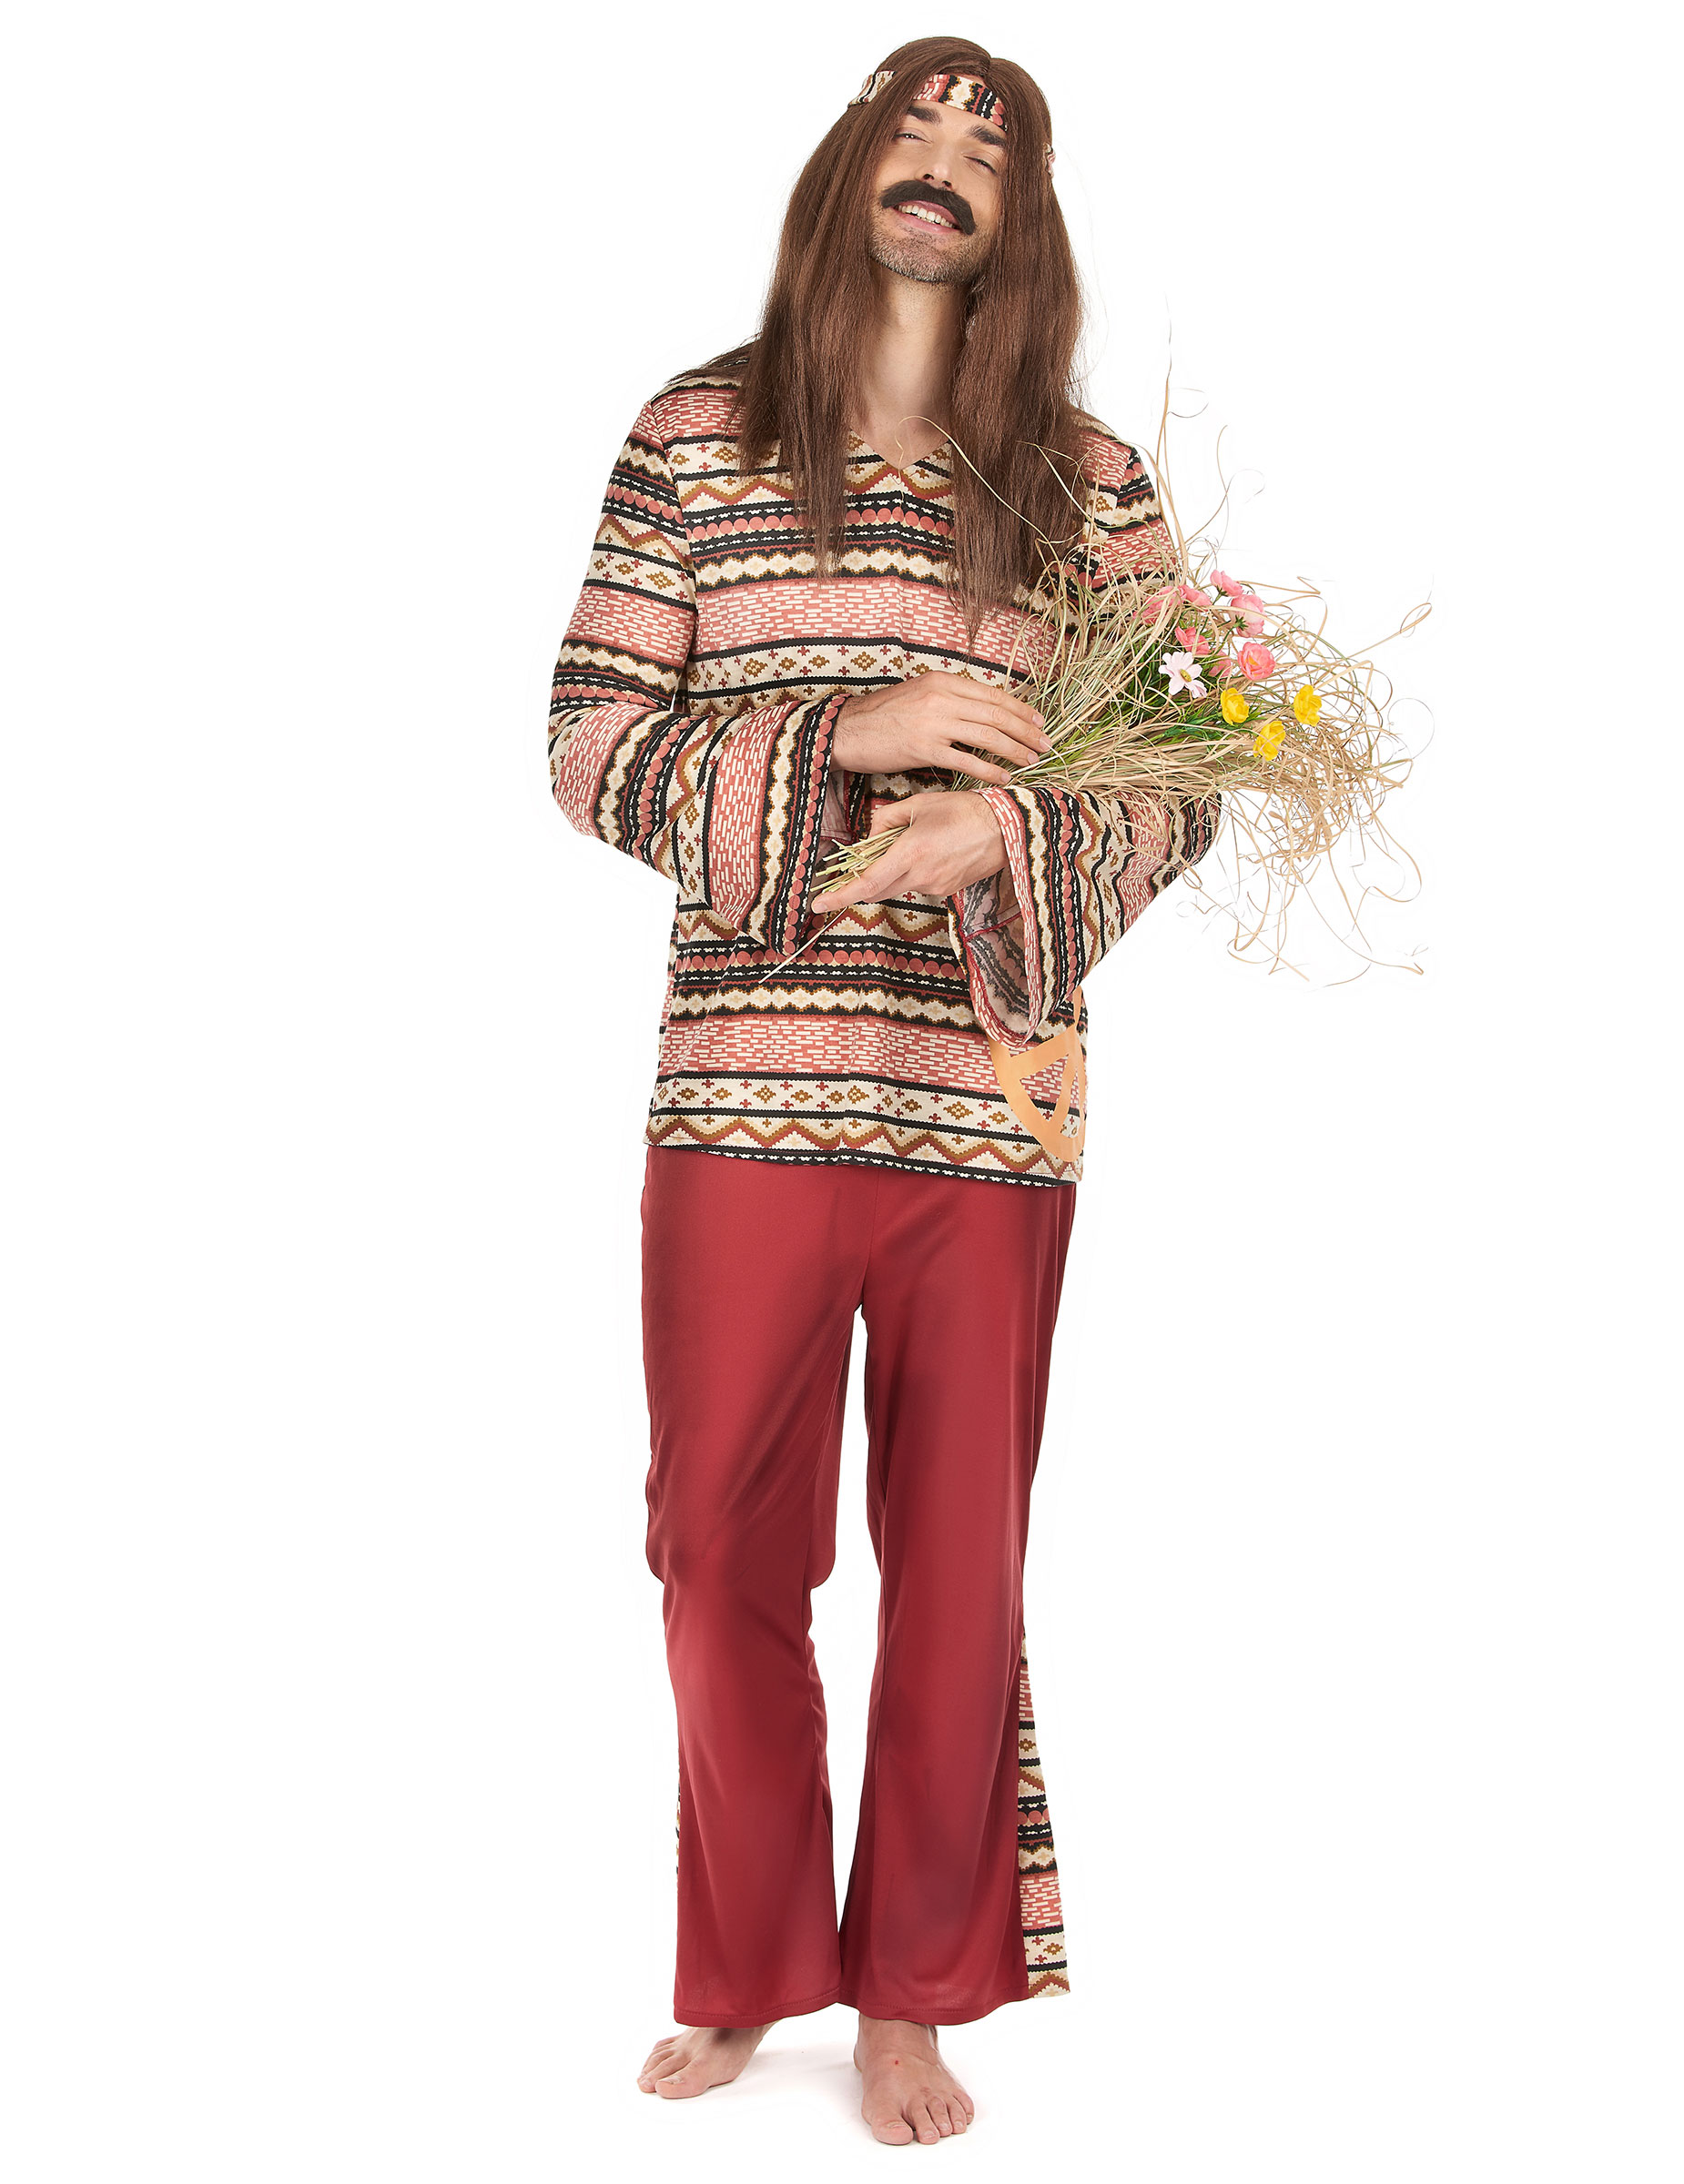 chemise homme hippie chic vtements homme chemises manches courtes quiksilver waterfalls gris. Black Bedroom Furniture Sets. Home Design Ideas